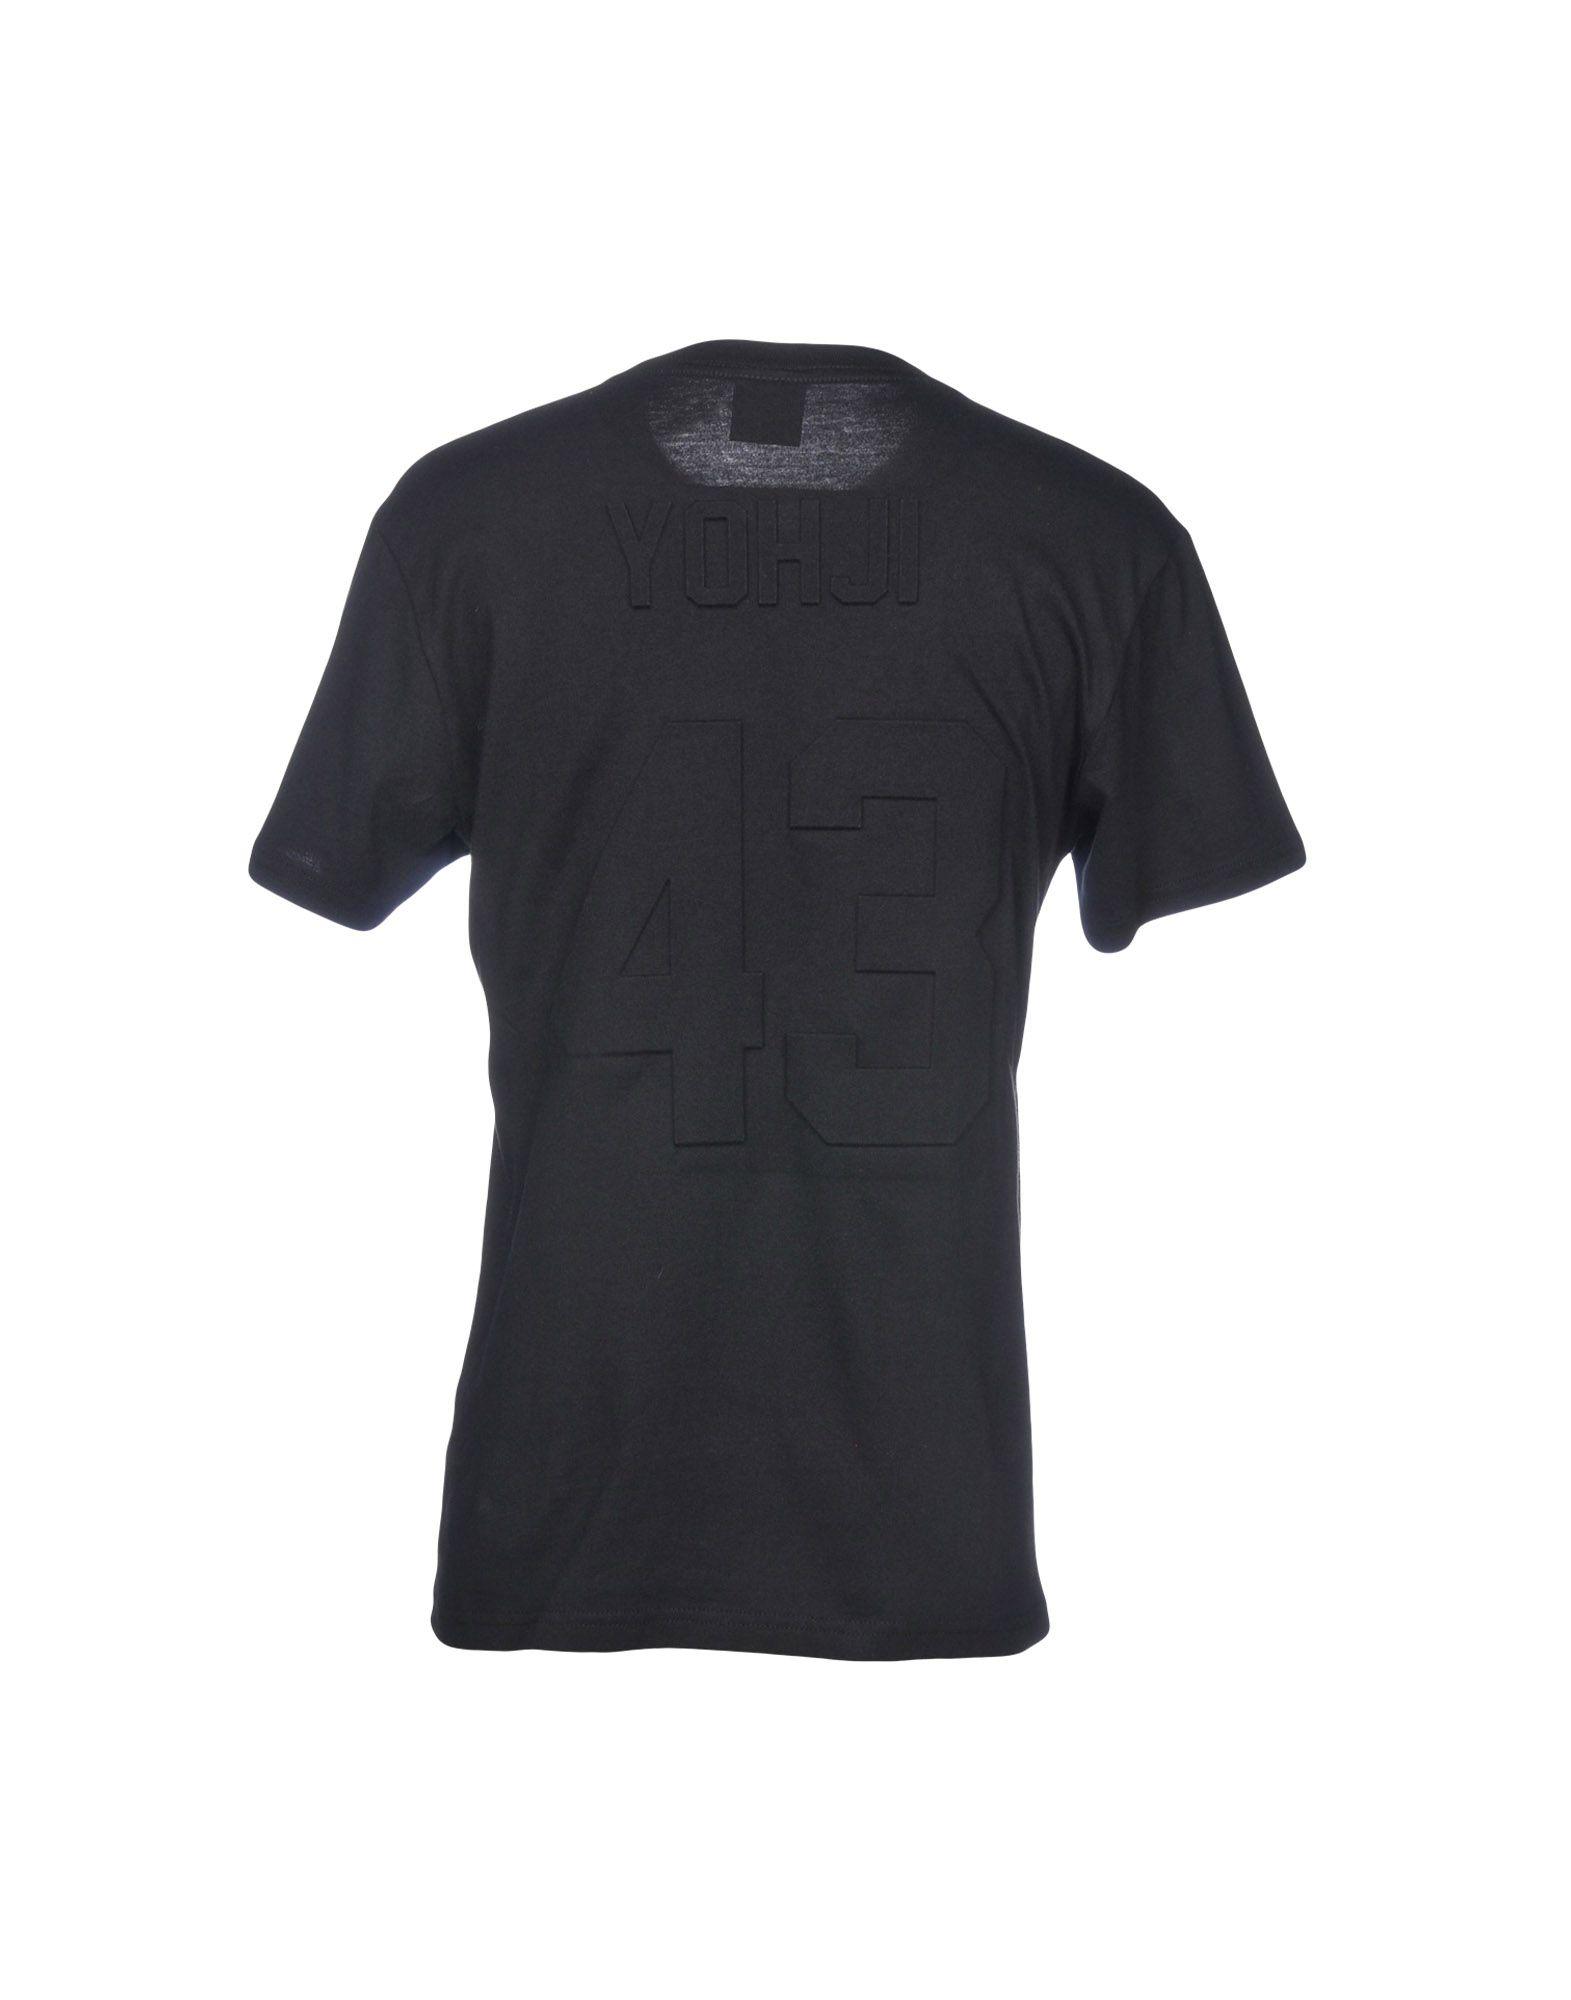 T-Shirt Les (Art)Ists Uomo Uomo (Art)Ists - 12205296VV eb5e33